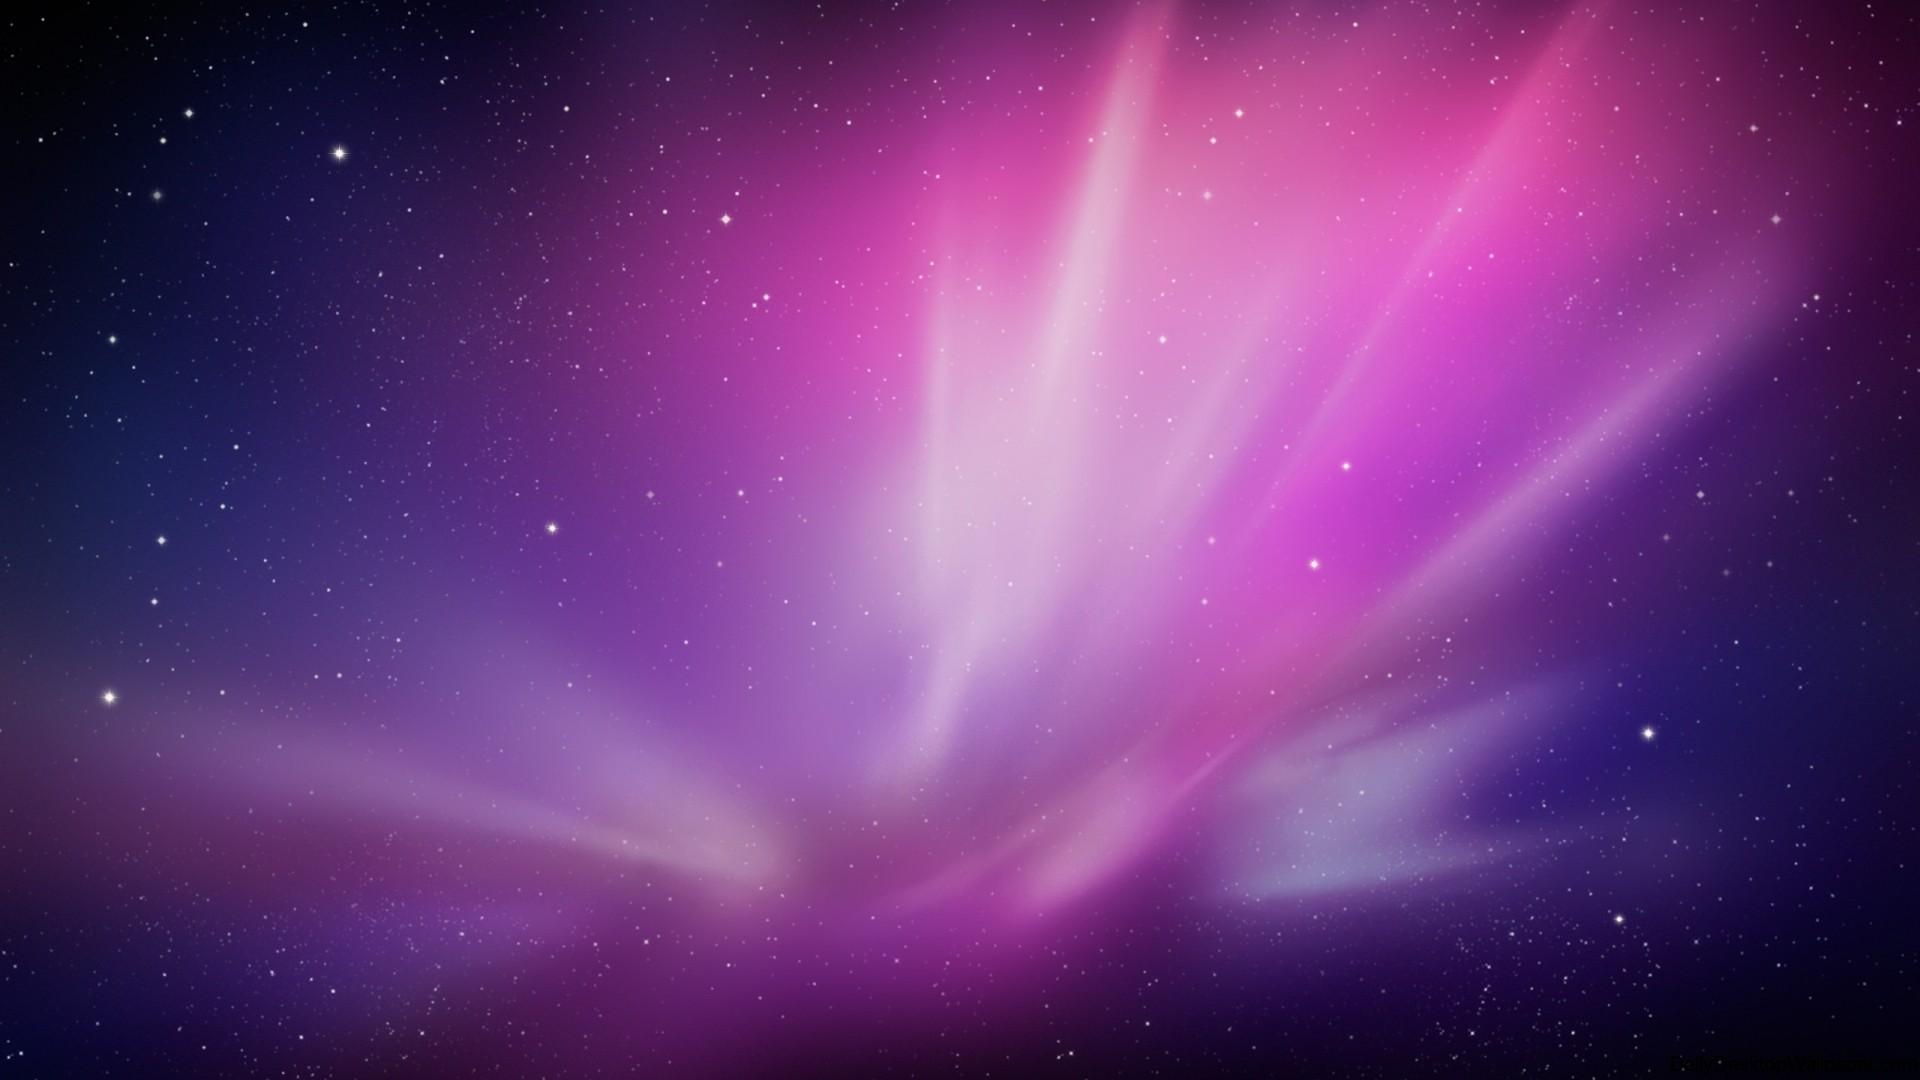 Free Download Download Famous Mac Os X Wallpaper Hd